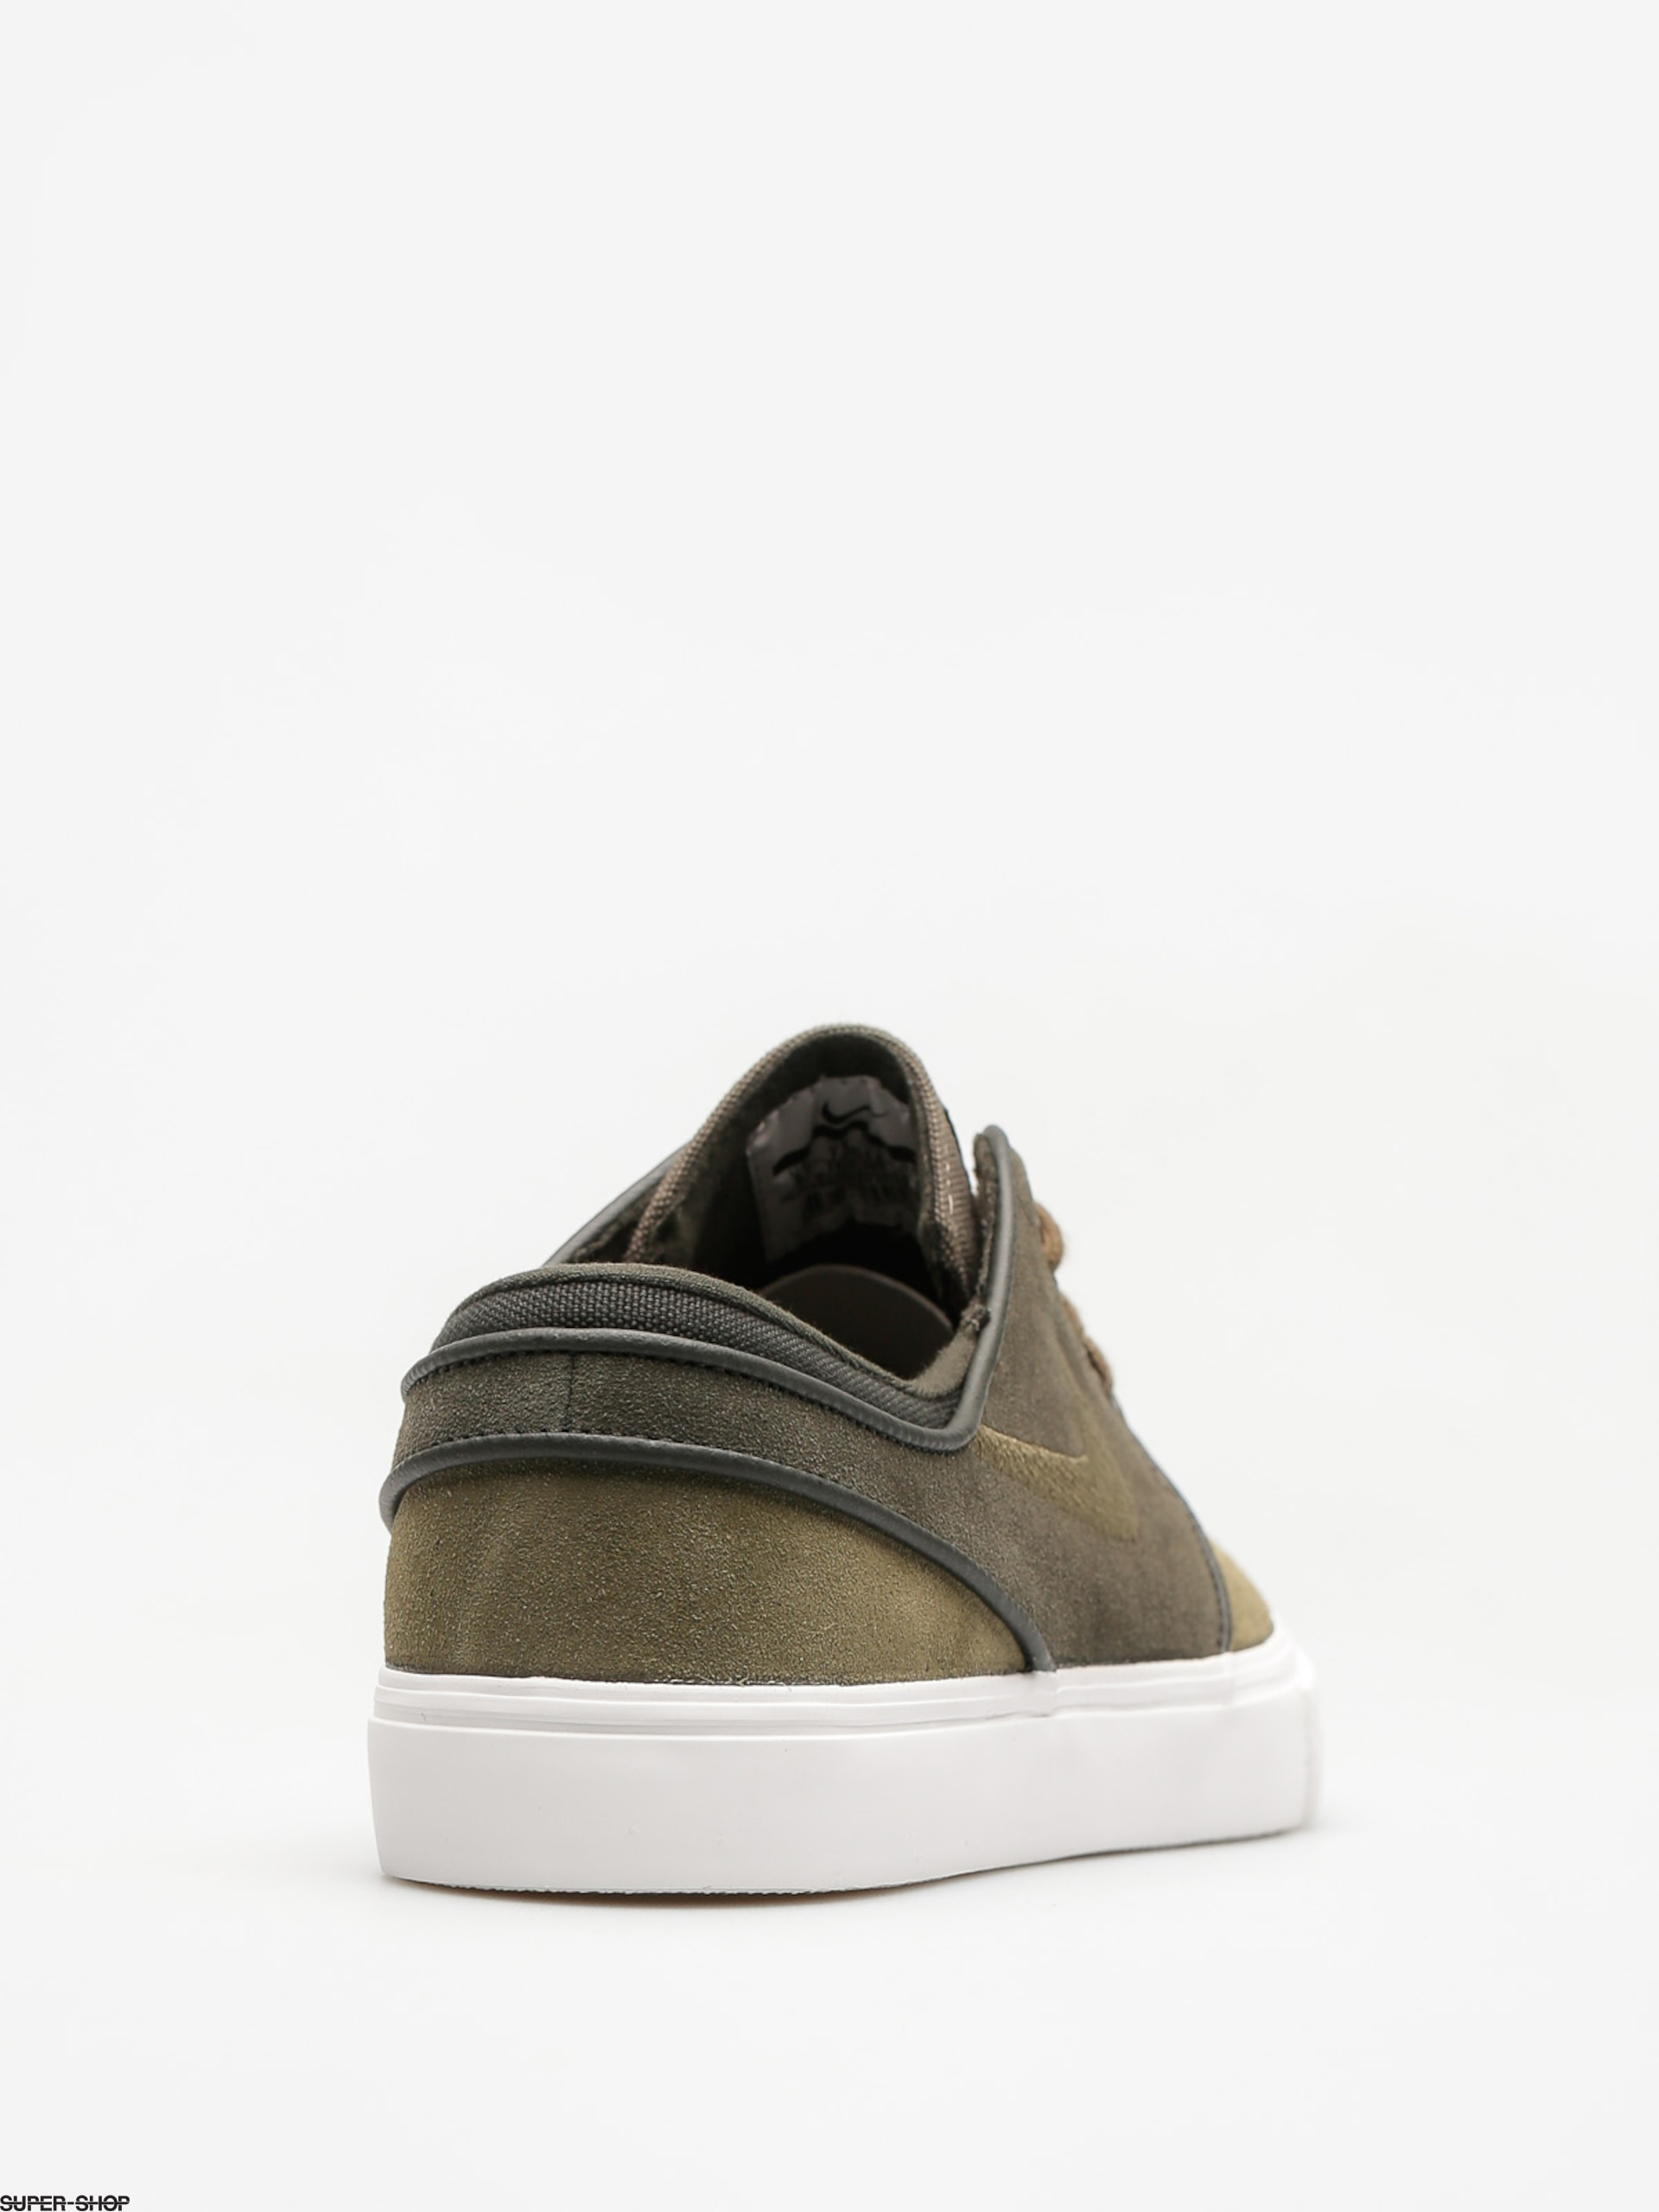 new arrival 50bf1 930ad Nike SB Shoes Zoom Stefan Janoski (sequoia medium olive summit white)